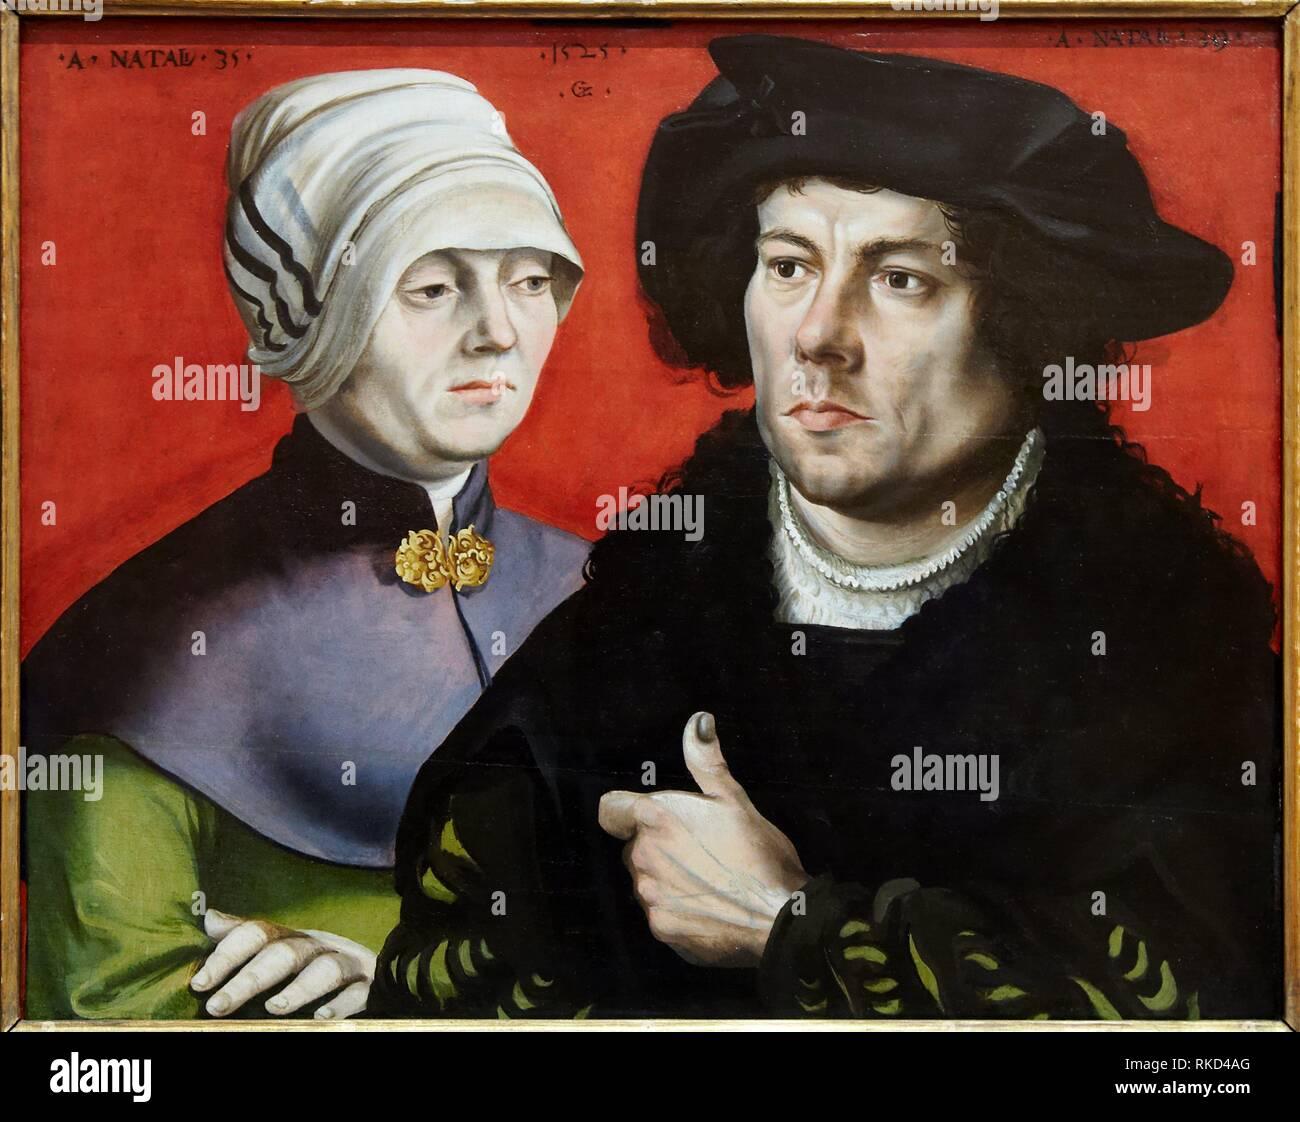 '''Portrait of a married couple'', Gabriel Zehender, 1525, Thyssen Bornemisza Museum, Madrid, Spain - Stock Image